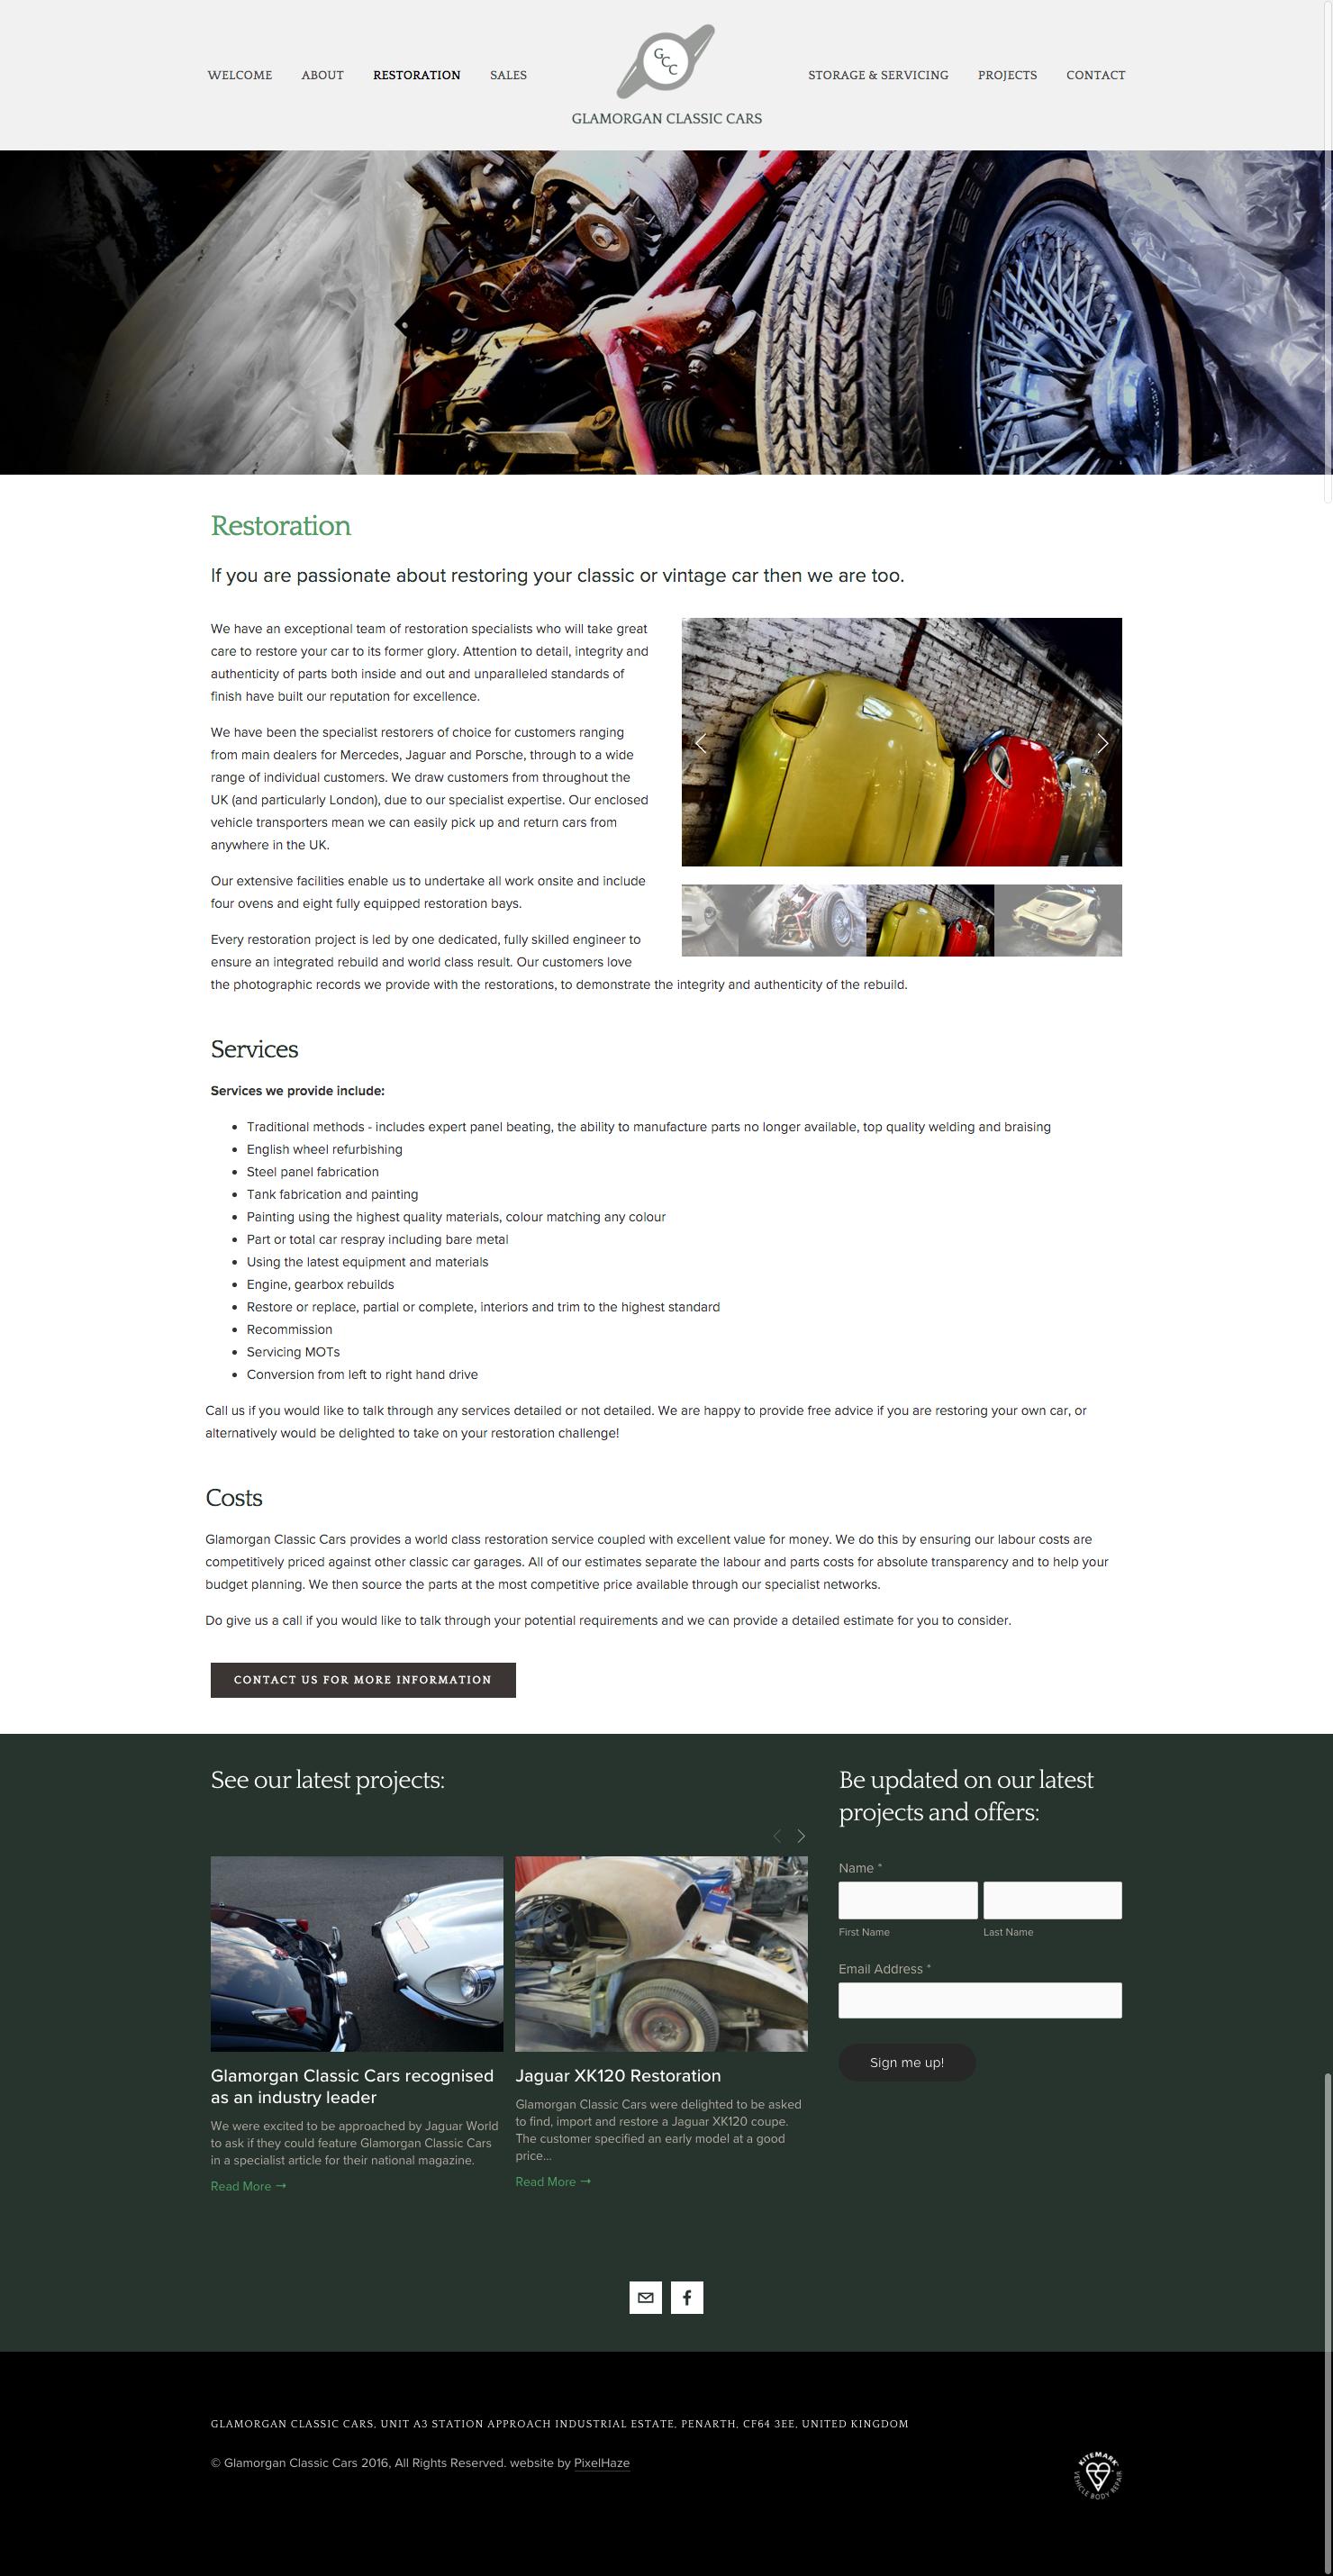 FireShot Capture 8 - Restoration — Glamorgan C_ - http___www.glamorganclassiccars.co.uk_restoration_.png